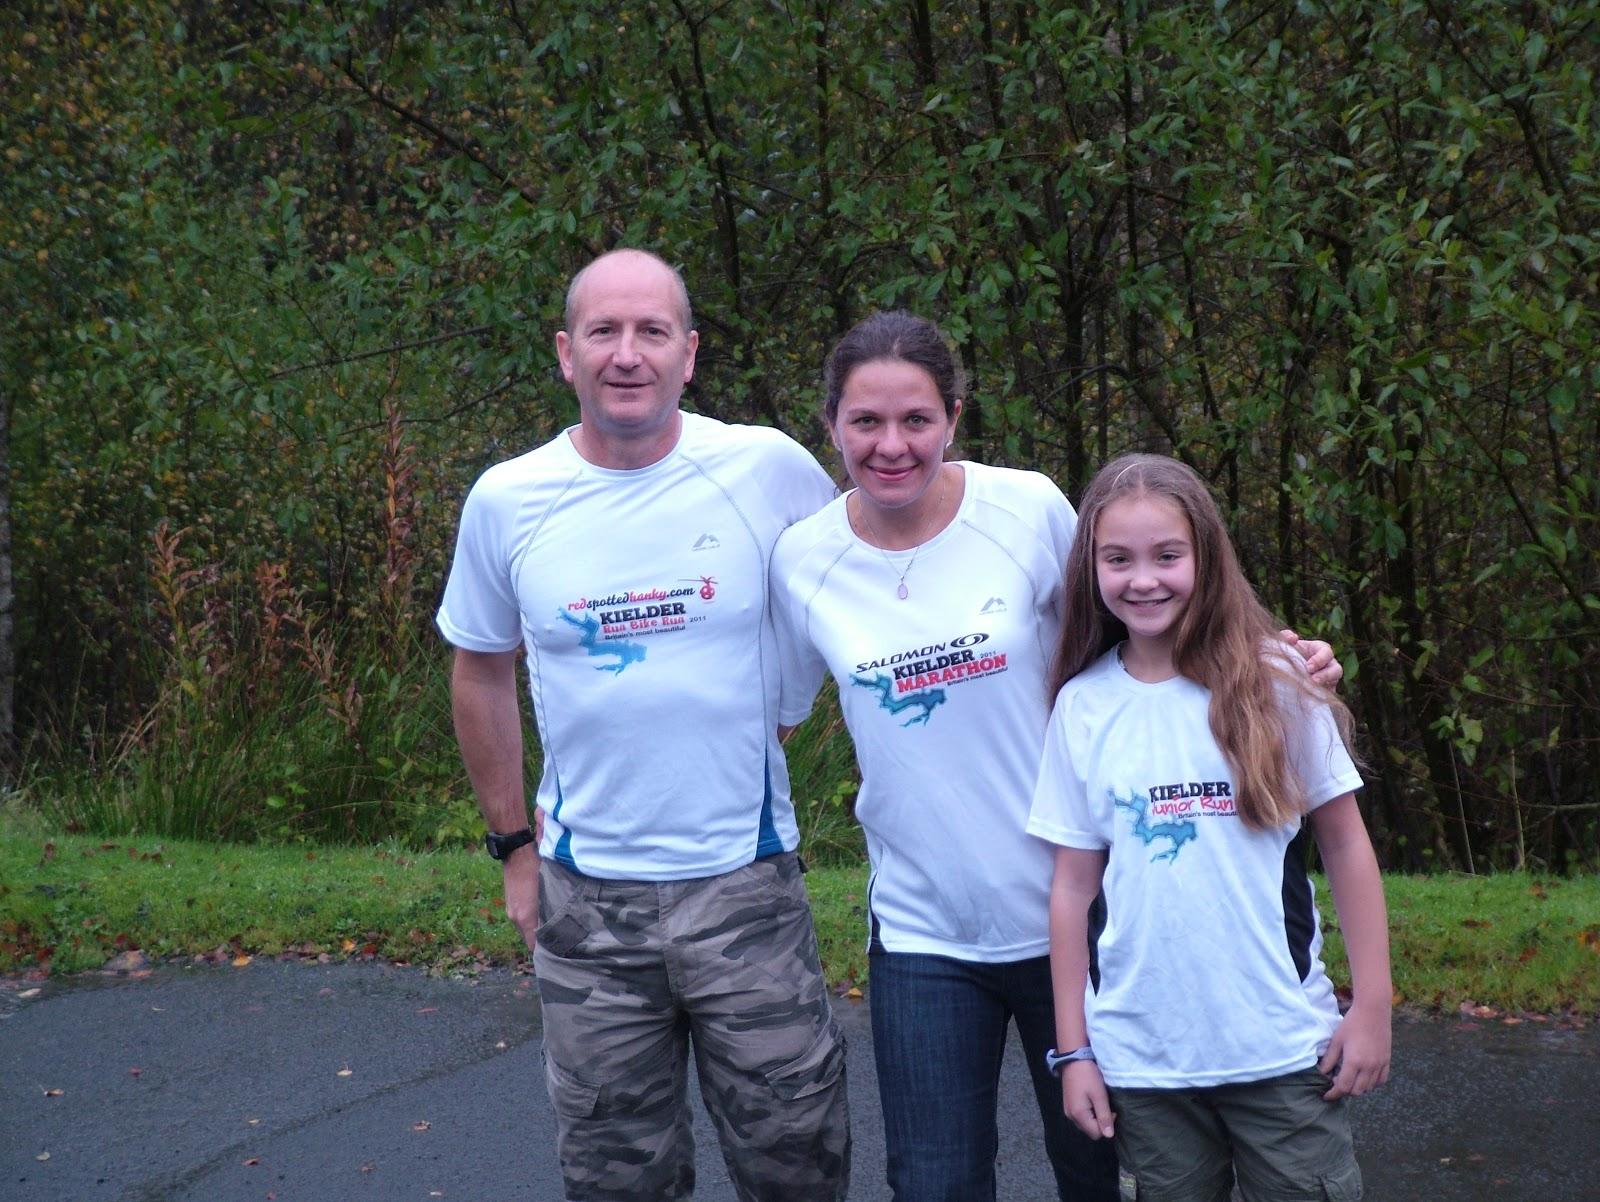 Kooky Girl Blog: Kielder Marathon 2011 - or should that be